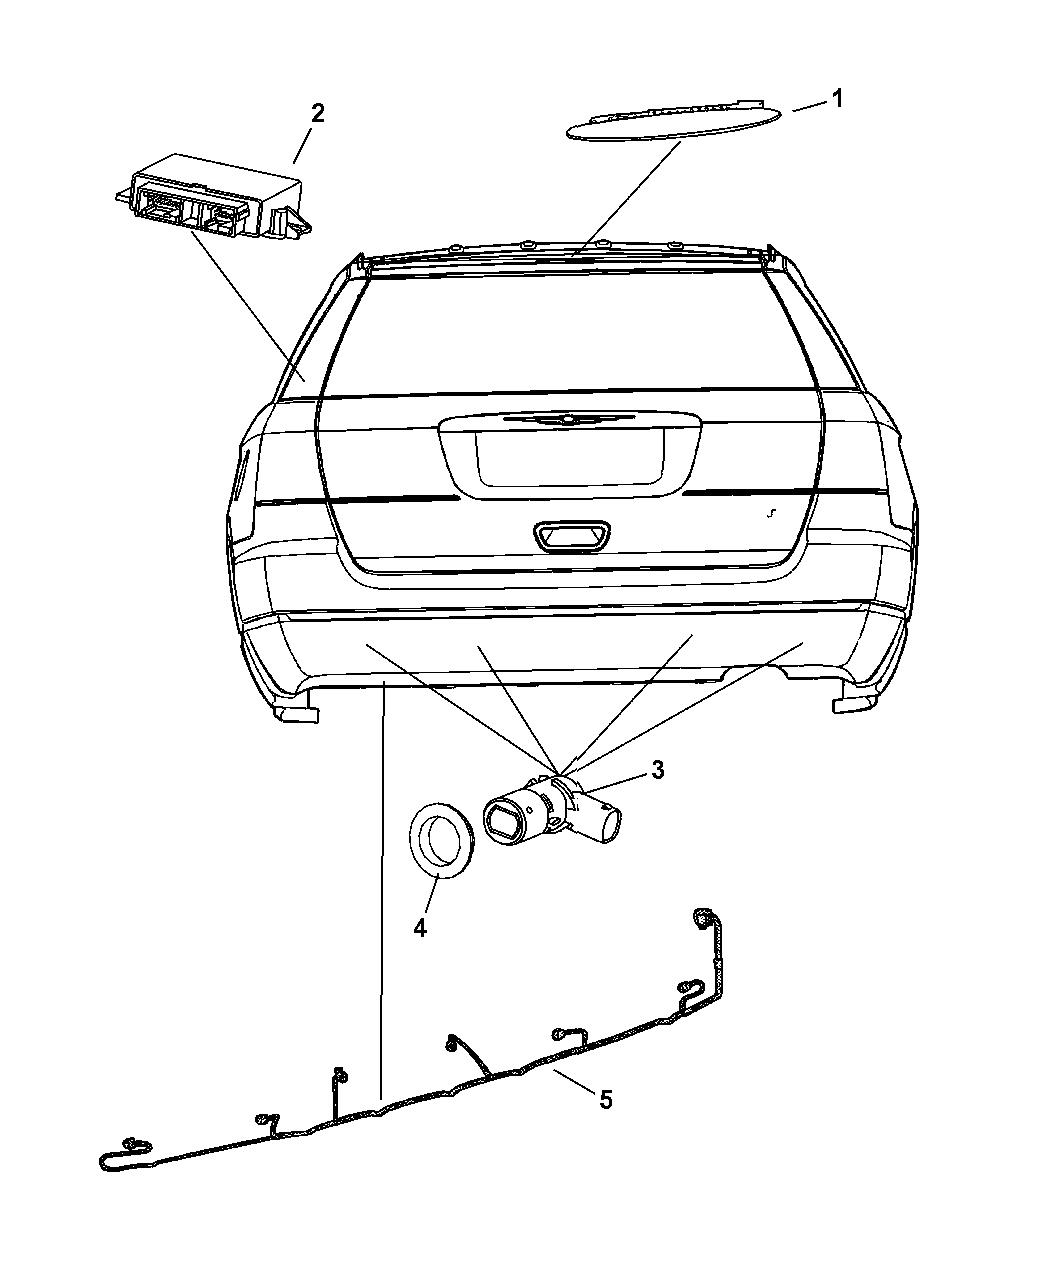 5026154AB - Genuine Chrysler MODULE-PARKING ASSIST